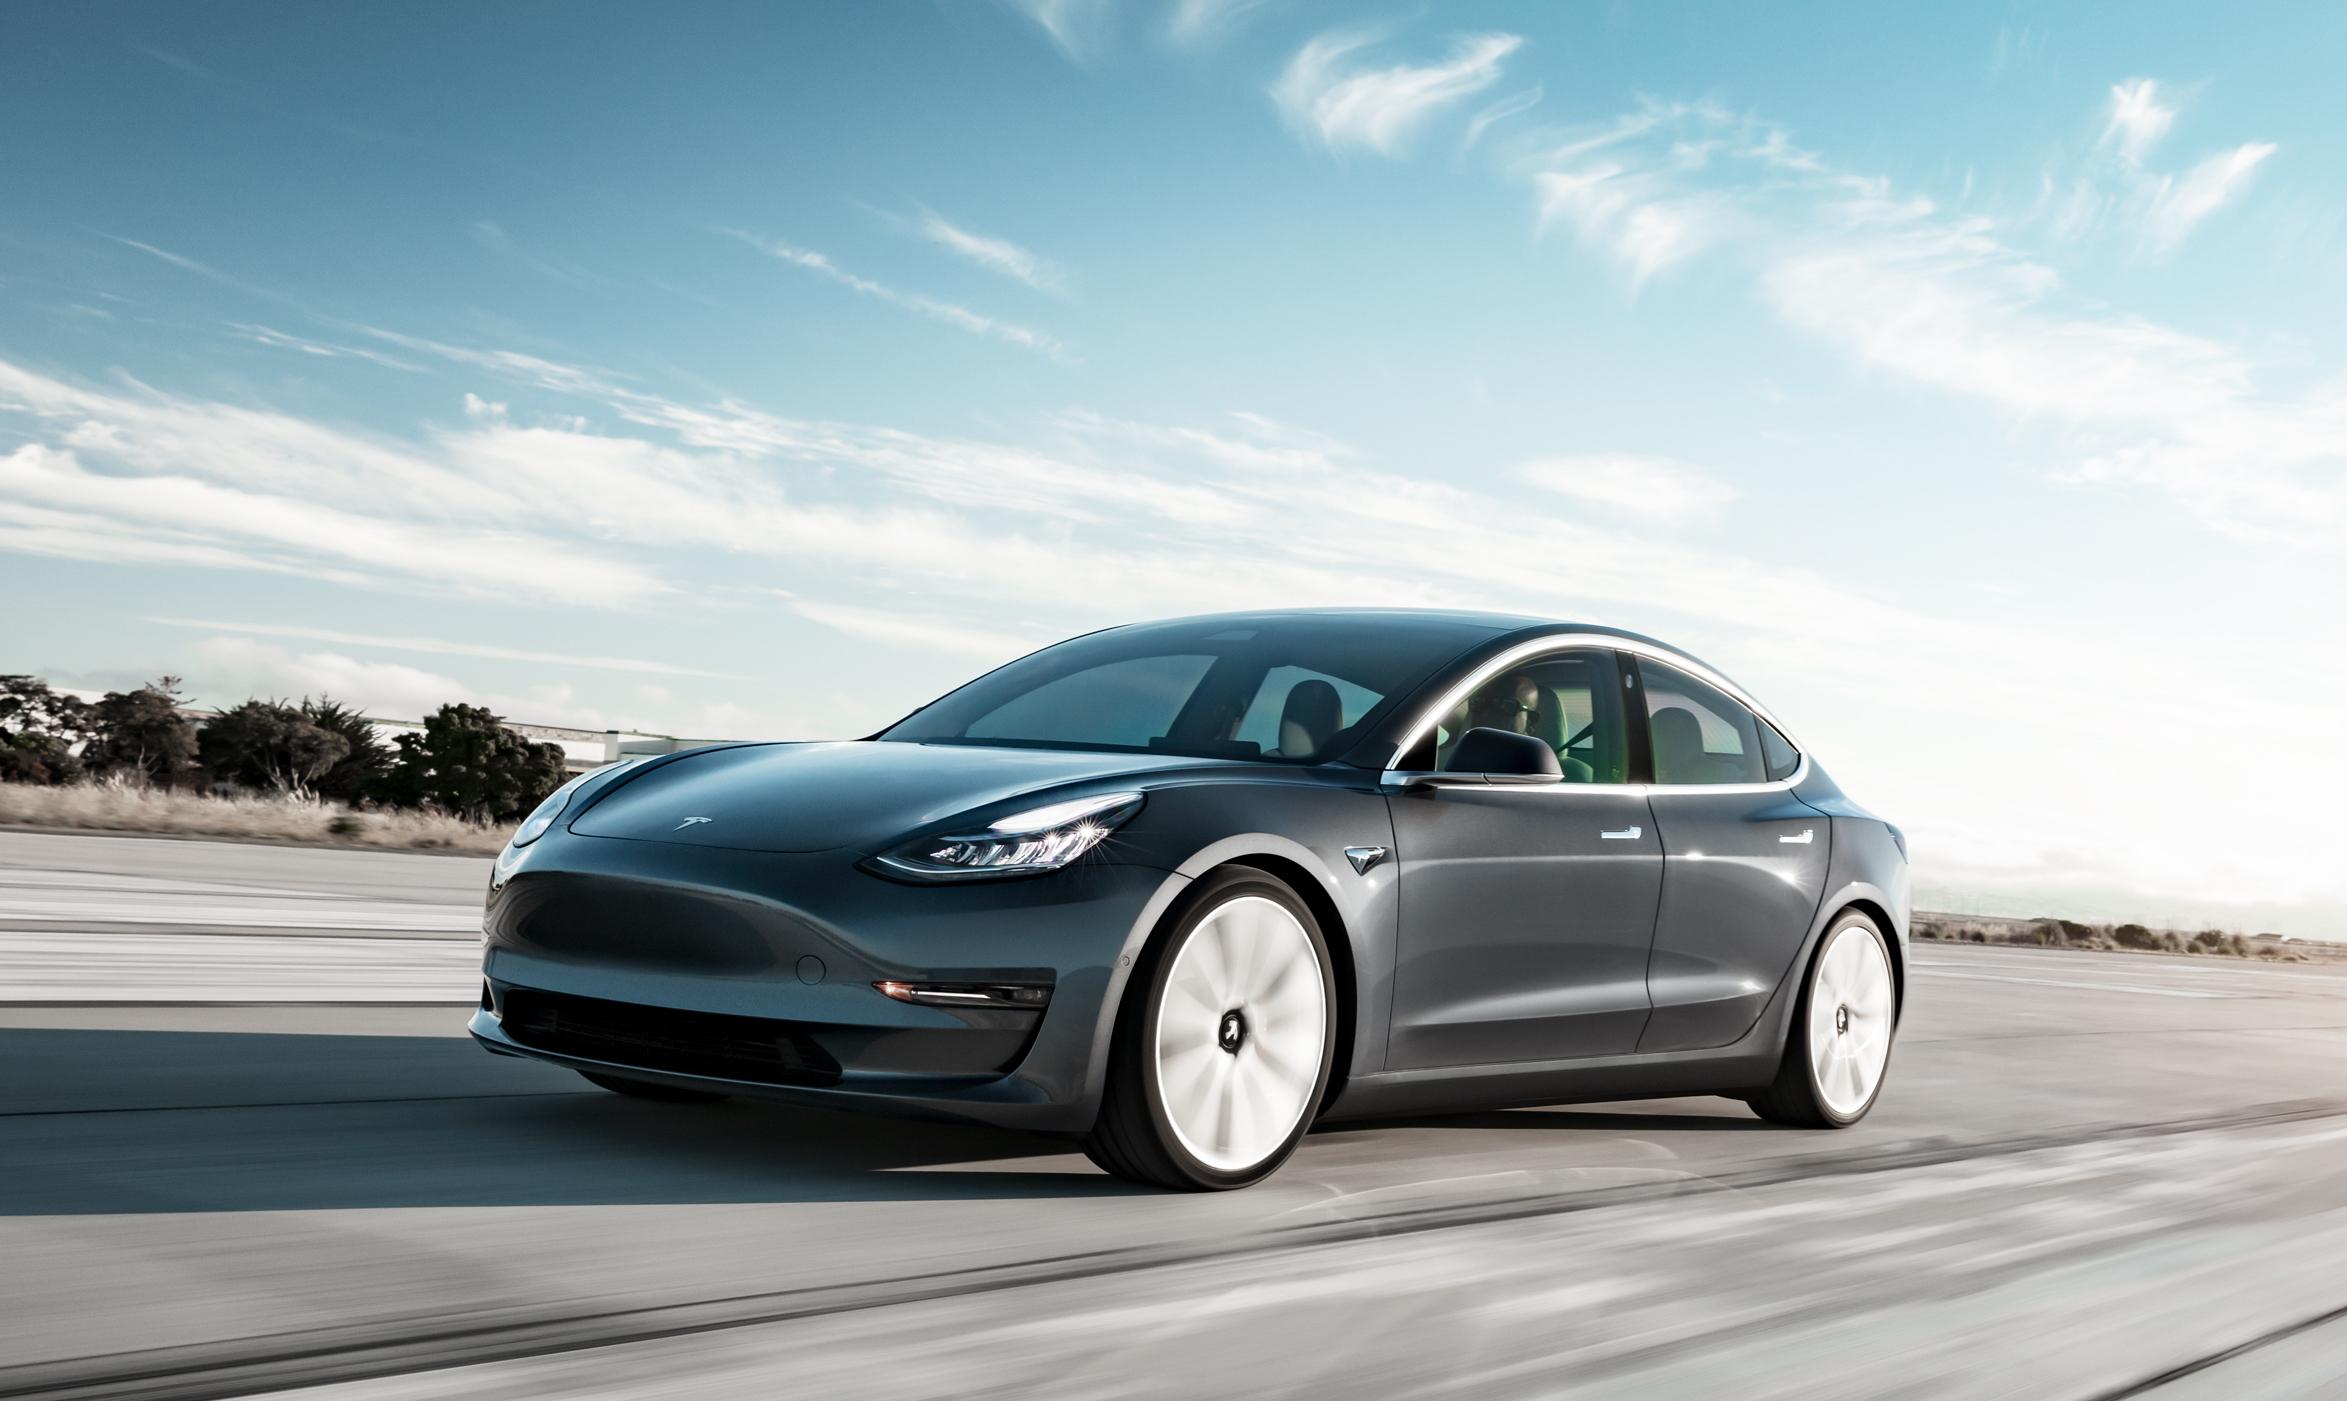 A dark gray Tesla Model 3 Performance, a compact high-performance electric luxury sedan.